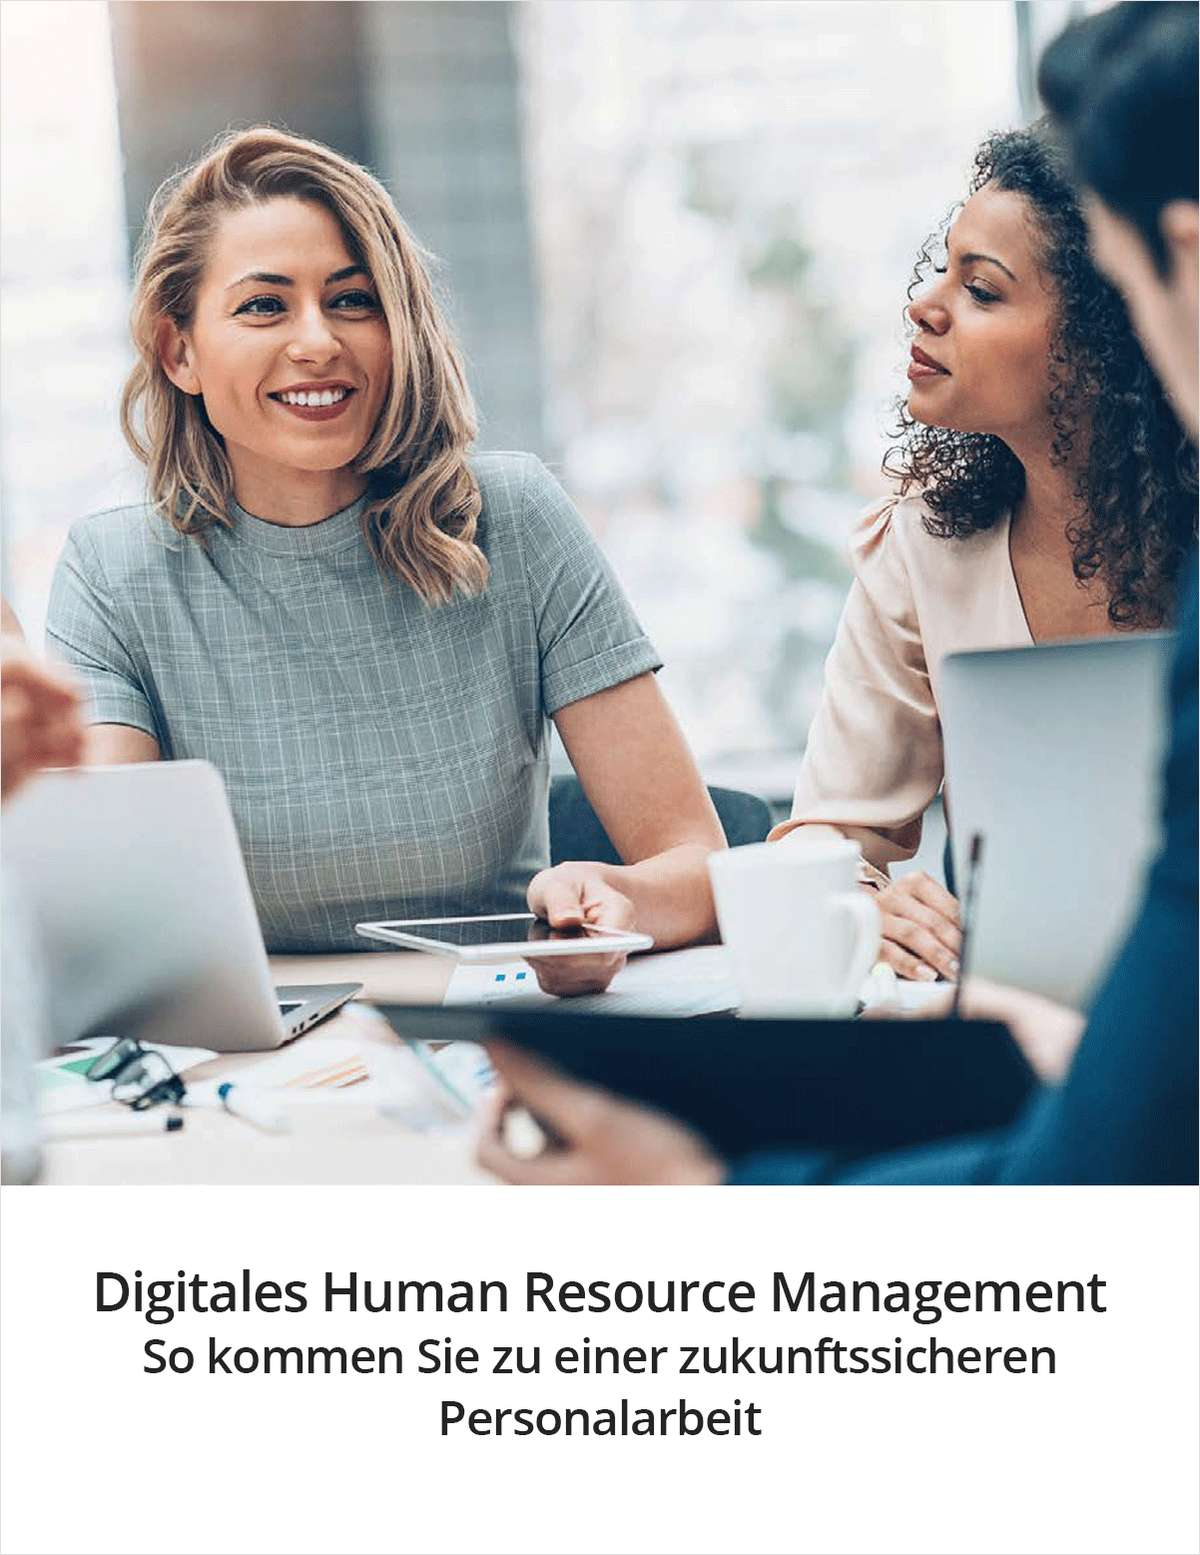 Digitales Human Resource Management